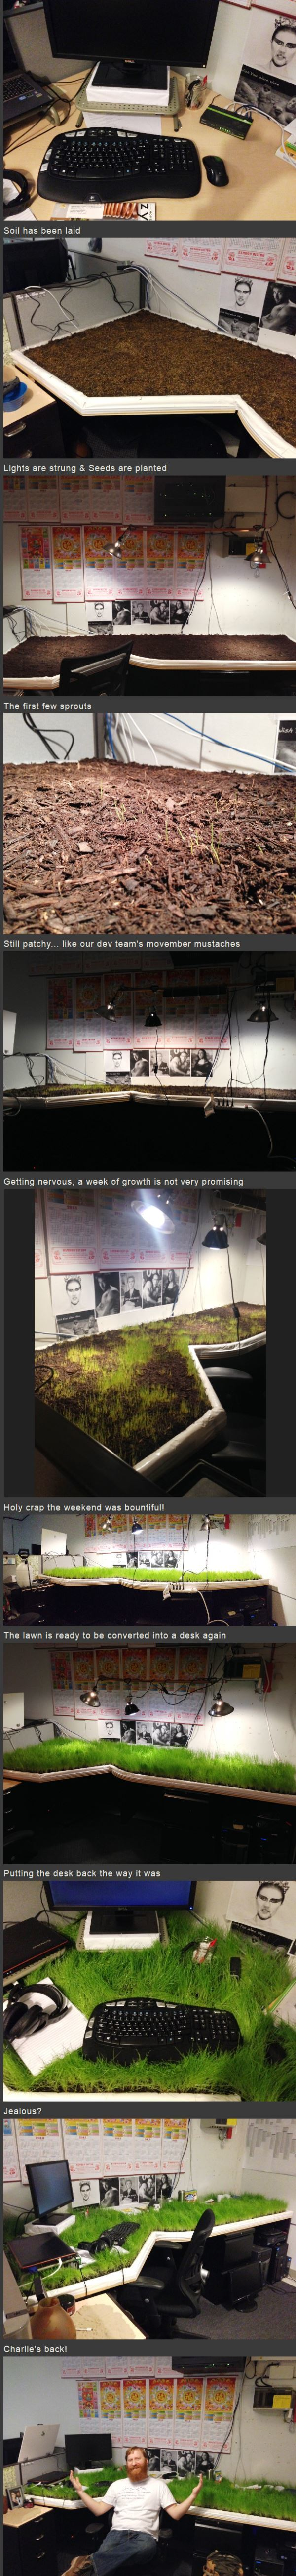 Genius Pranks Grass Office